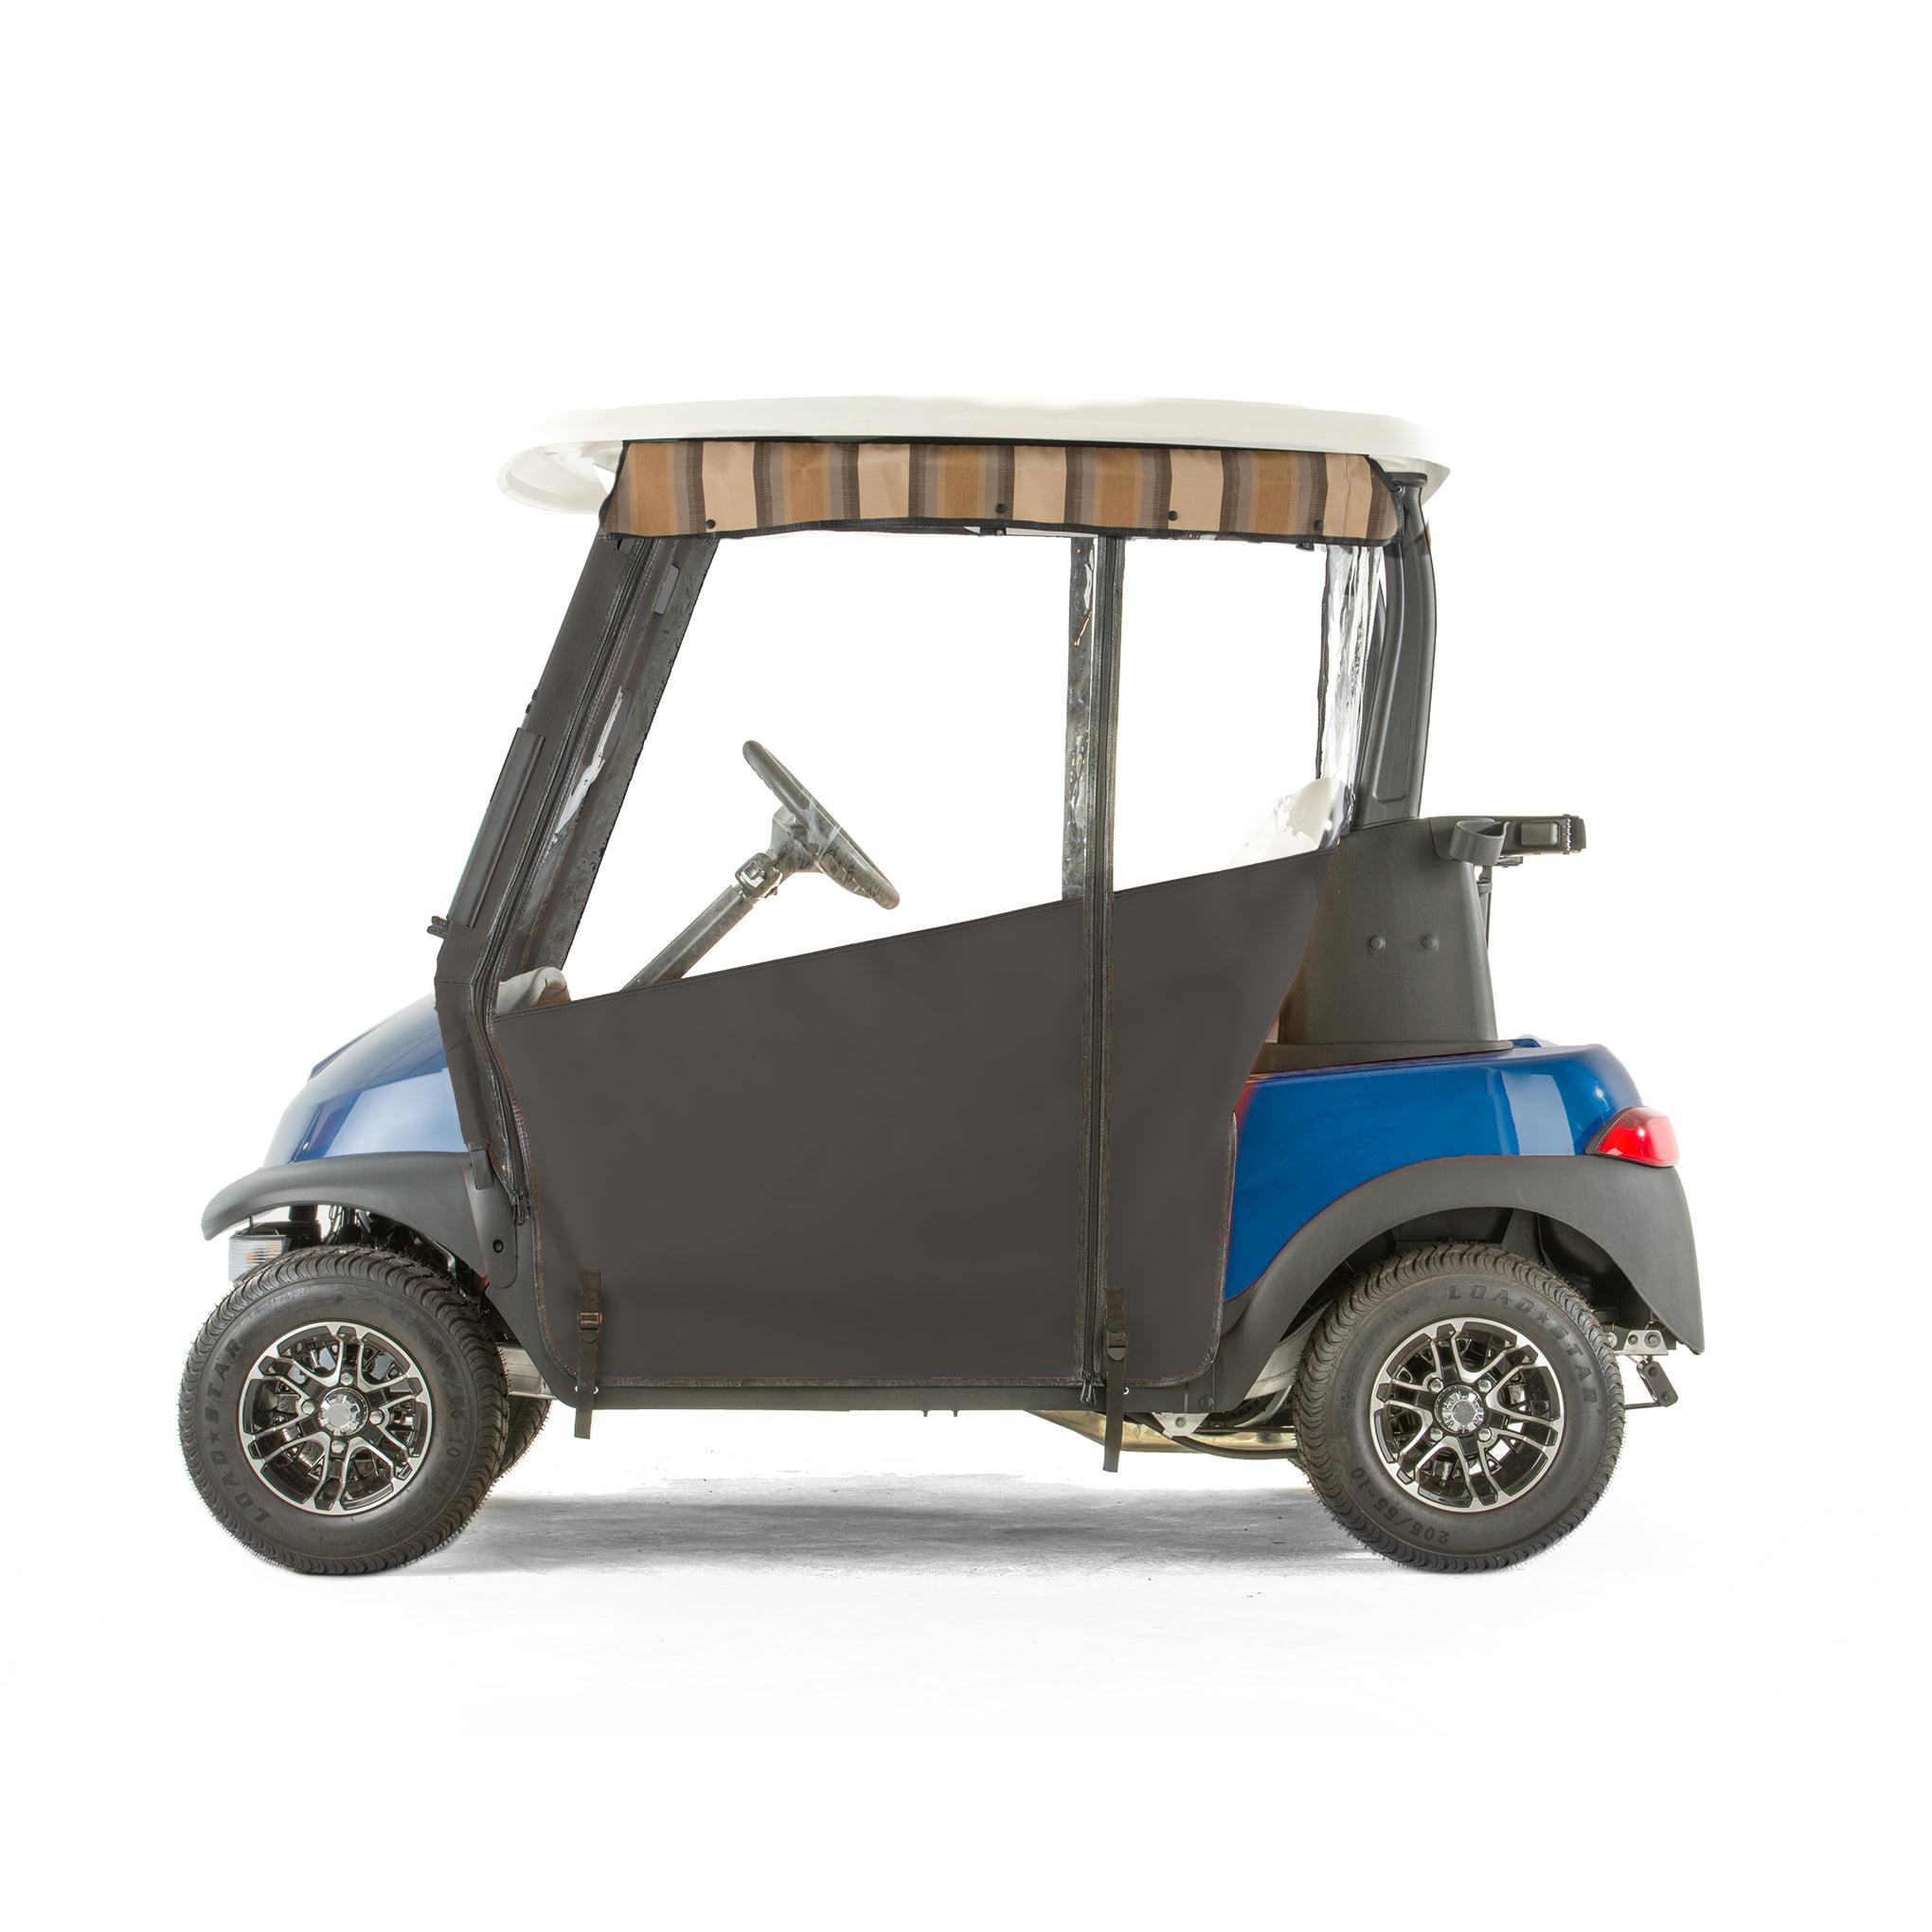 Club Car Precedent Golf Cart PRO-TOURING Sunbrella Track Enclosure Black by